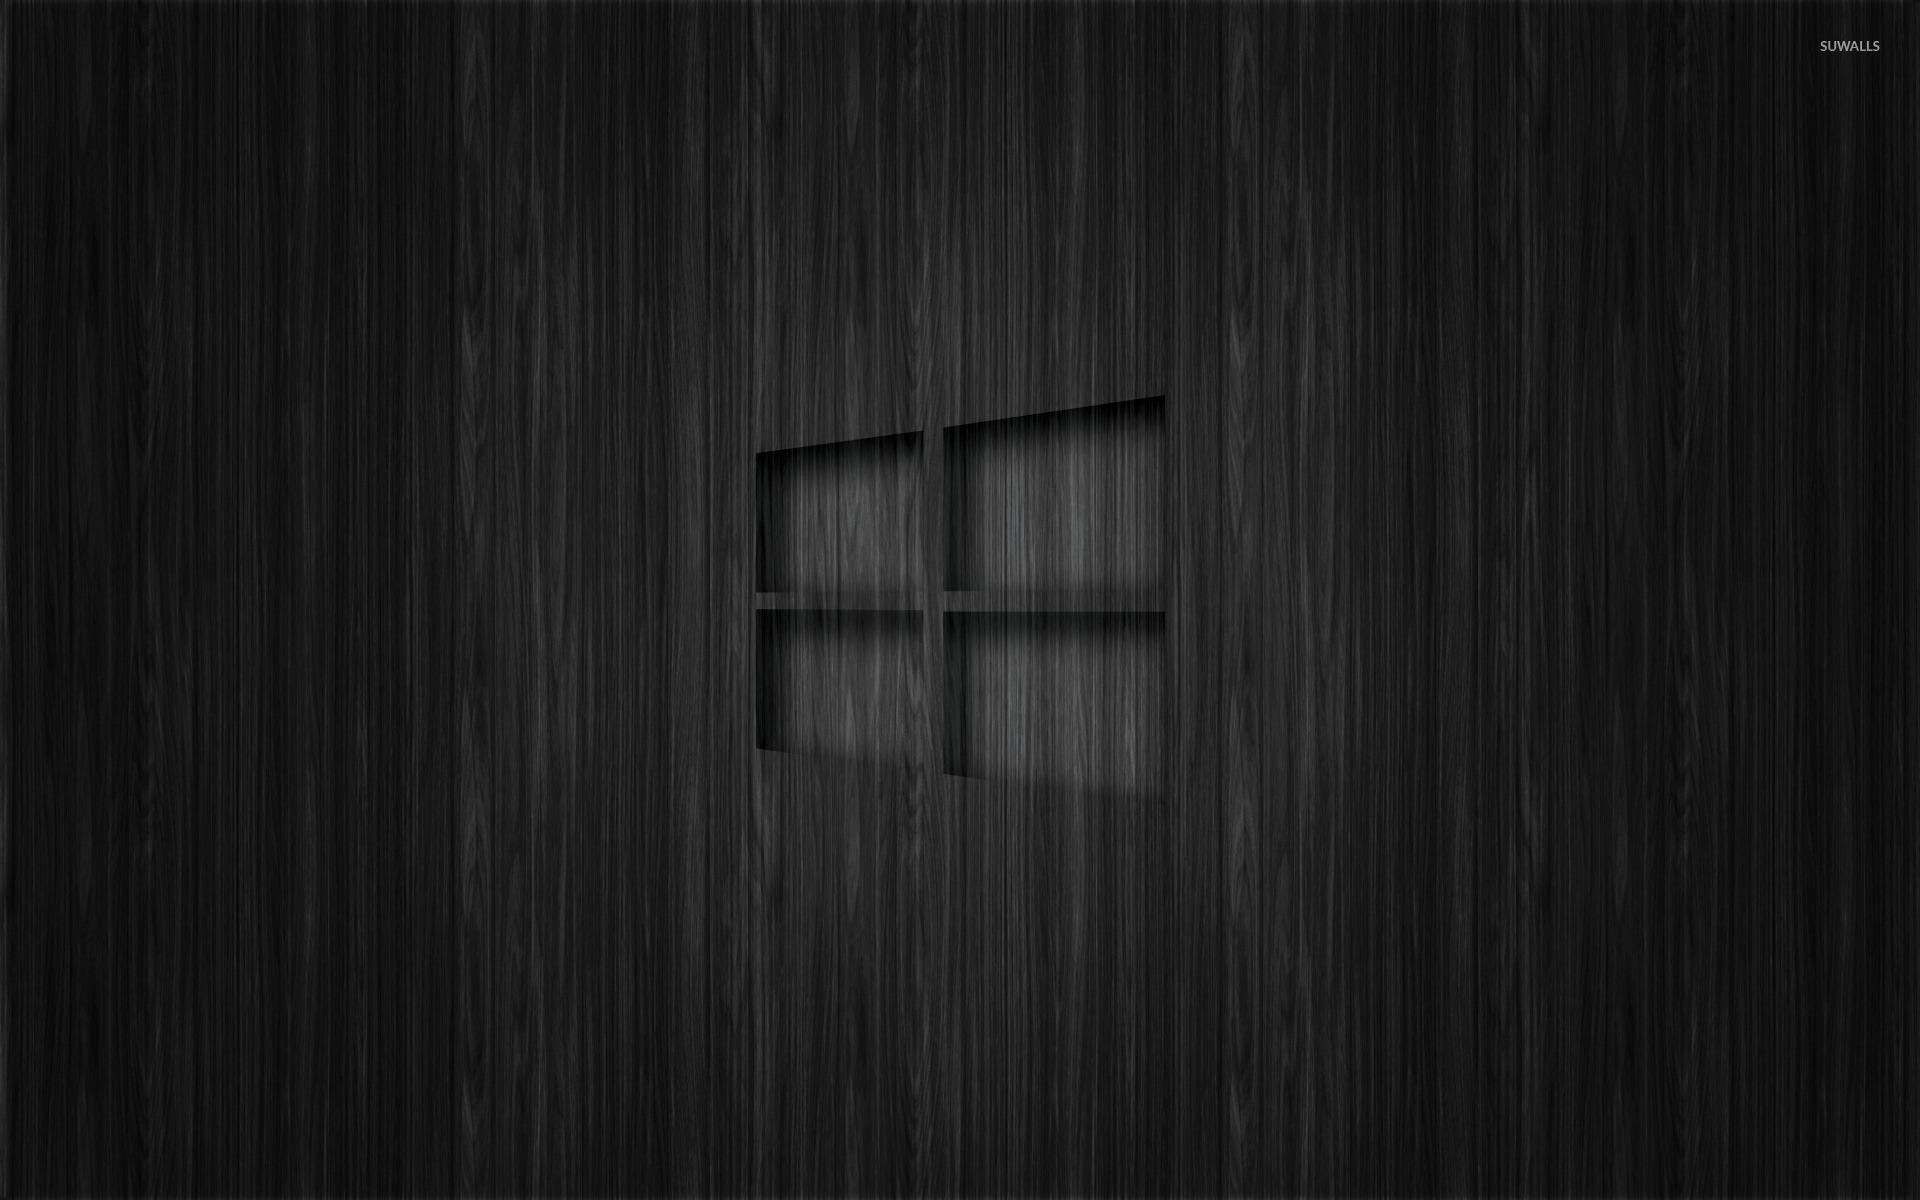 Windows 10 transparent logo on dark wood wallpaper 1680x1050 1680x1050